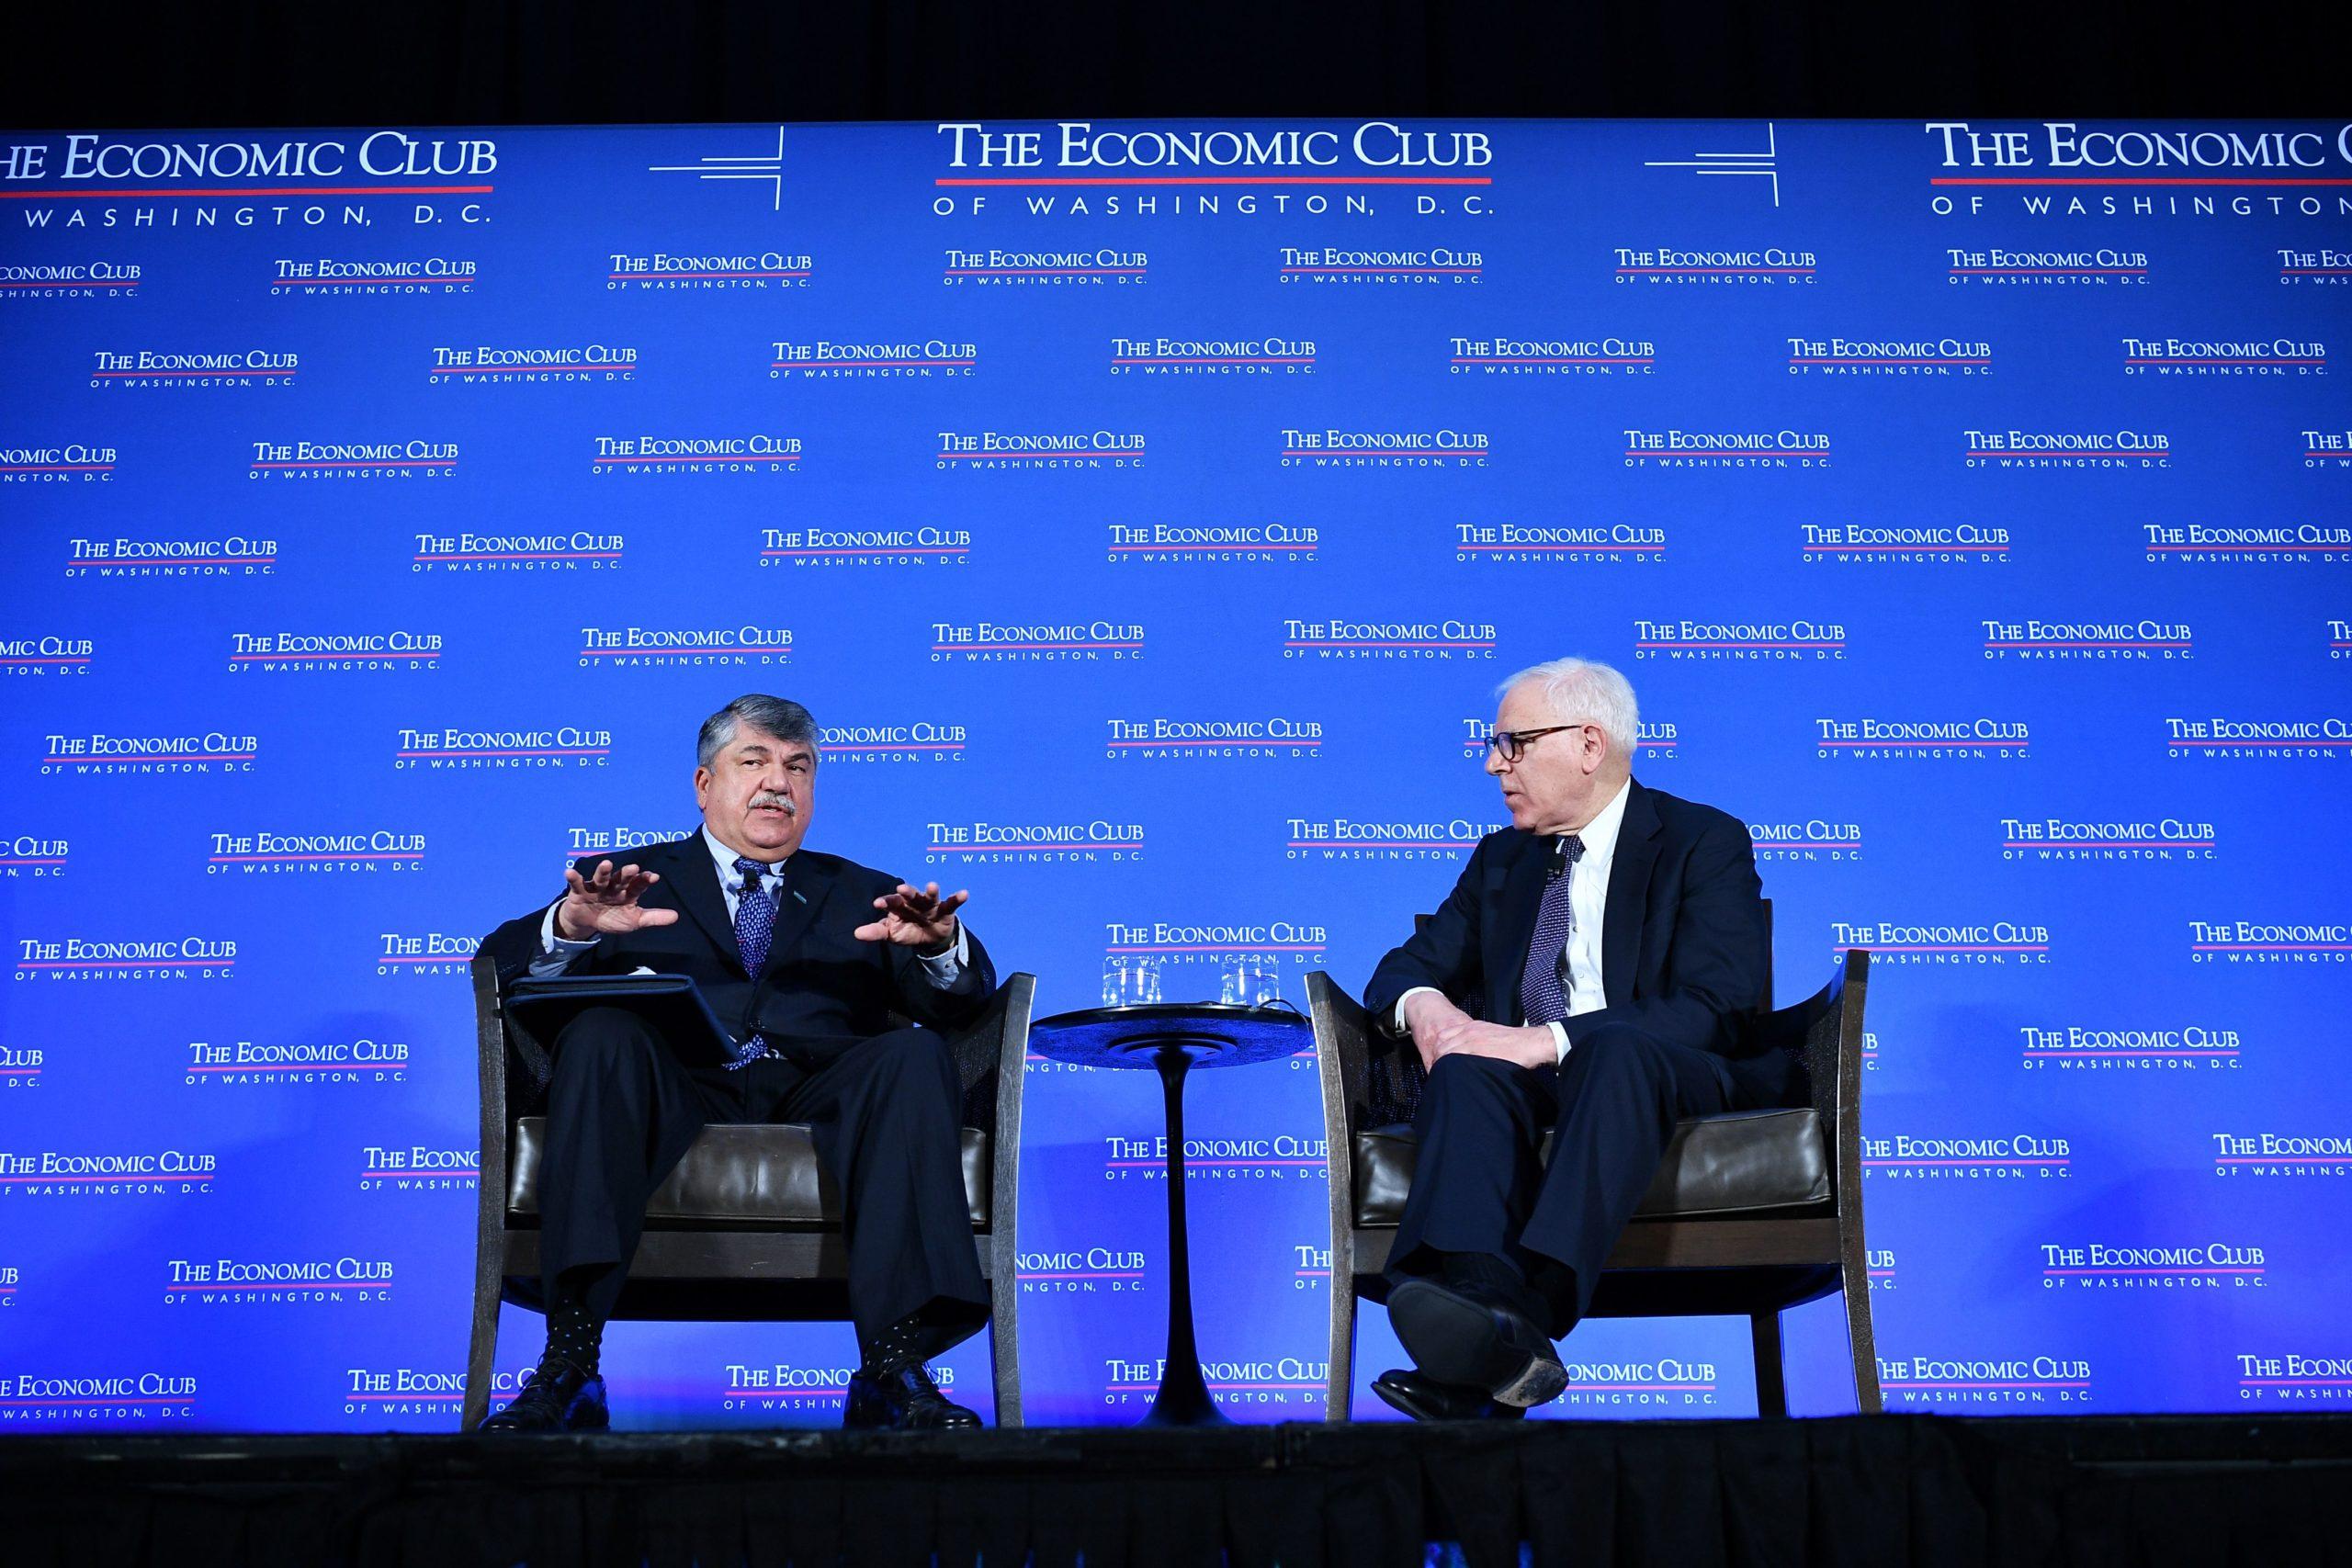 AFL-CIO President Richard Trumka speaks with The Economic Club of Washington President David Rubenstein in April 2019. (Mandel Ngan/AFP via Getty Images)